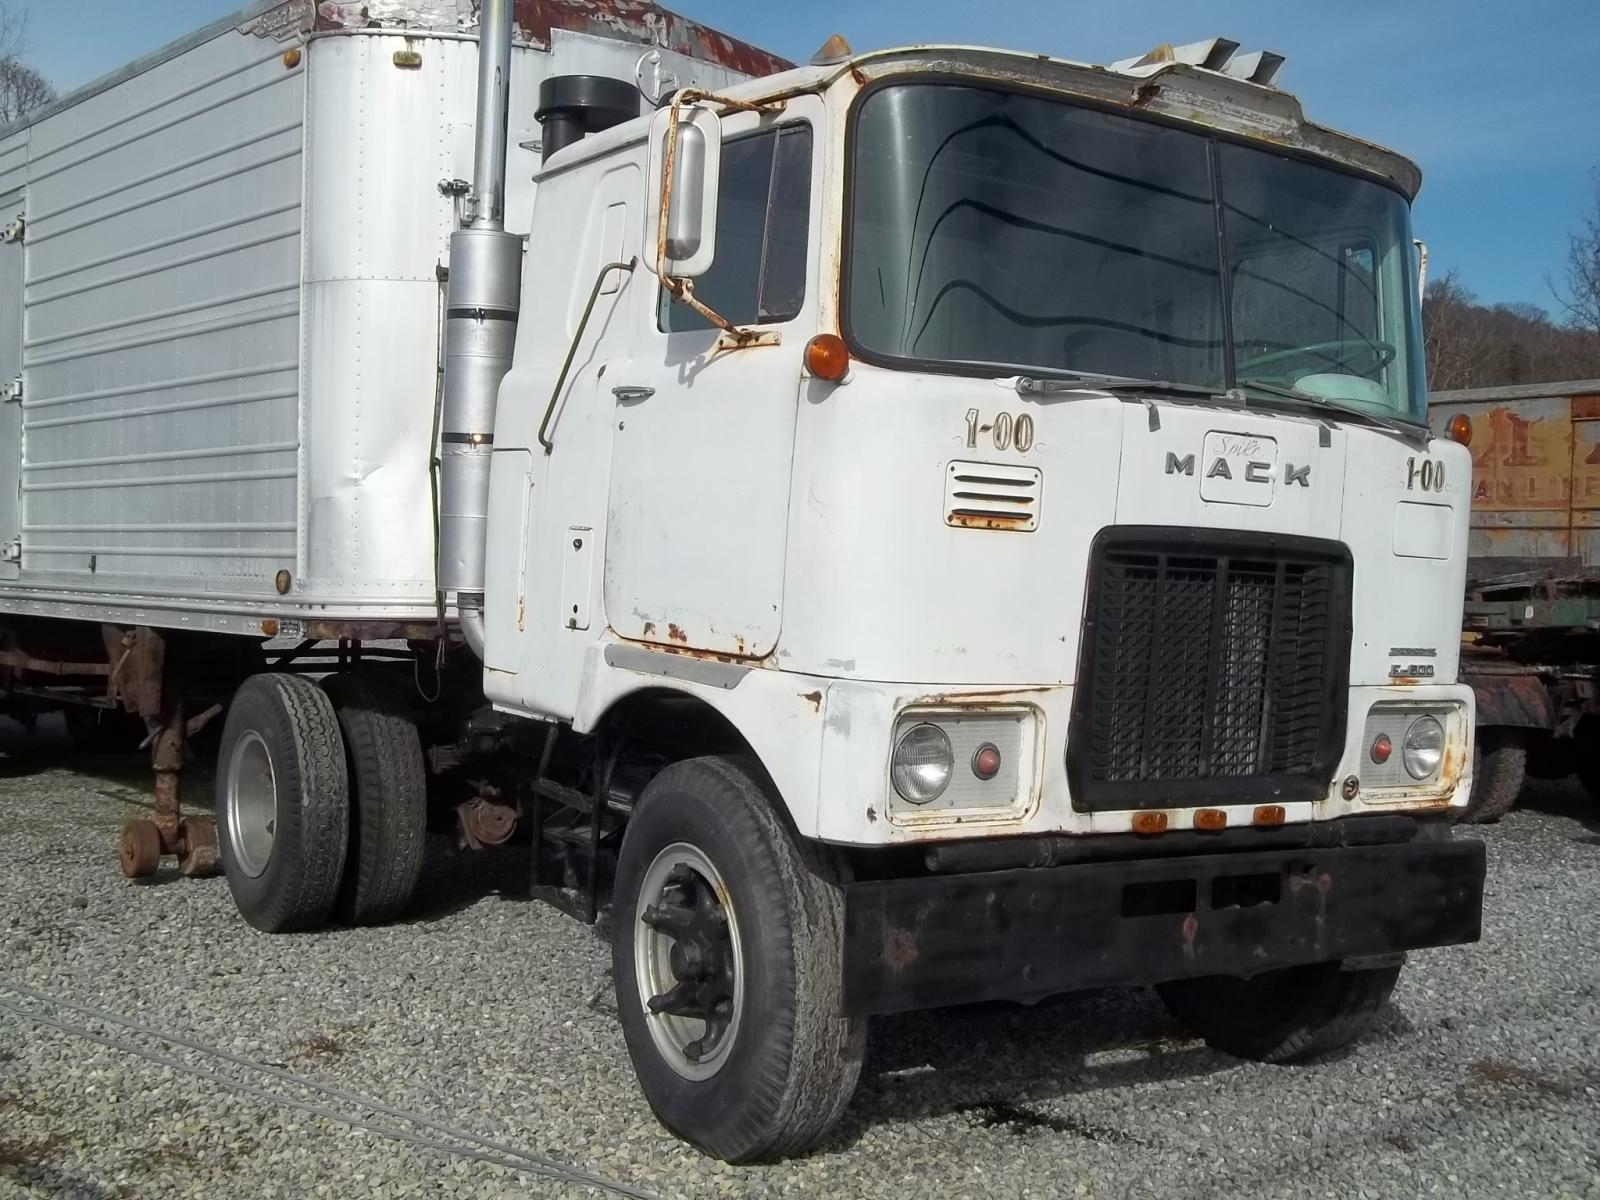 Trucks For Sale In Va >> 1966 mack f - Trucks for Sale - BigMackTrucks.com